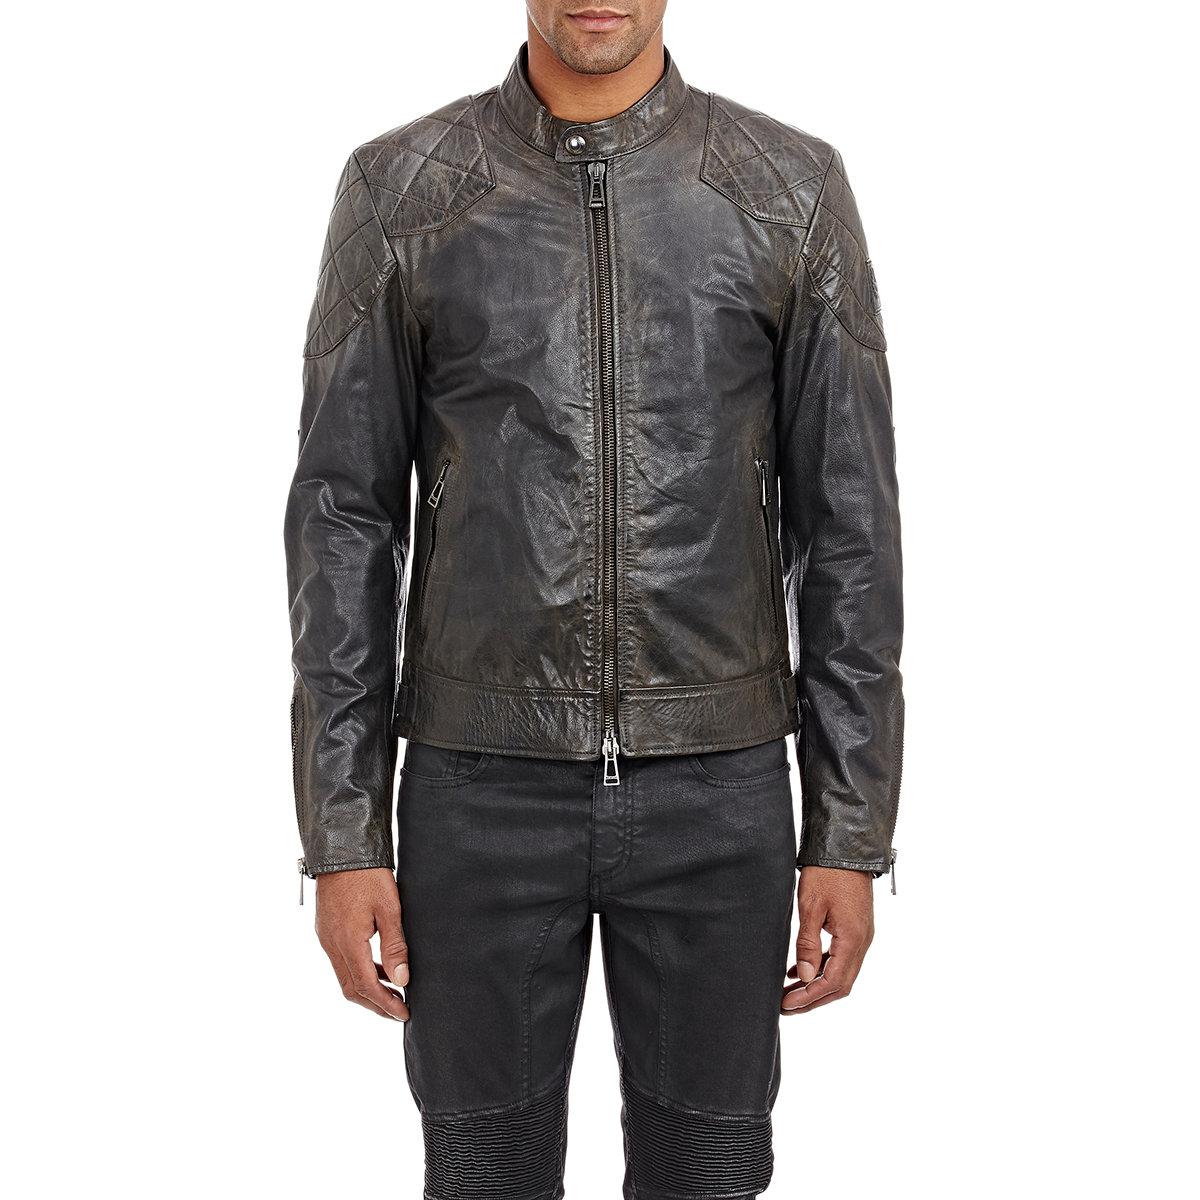 Leather jackets black friday deals – Modern fashion jacket photo blog